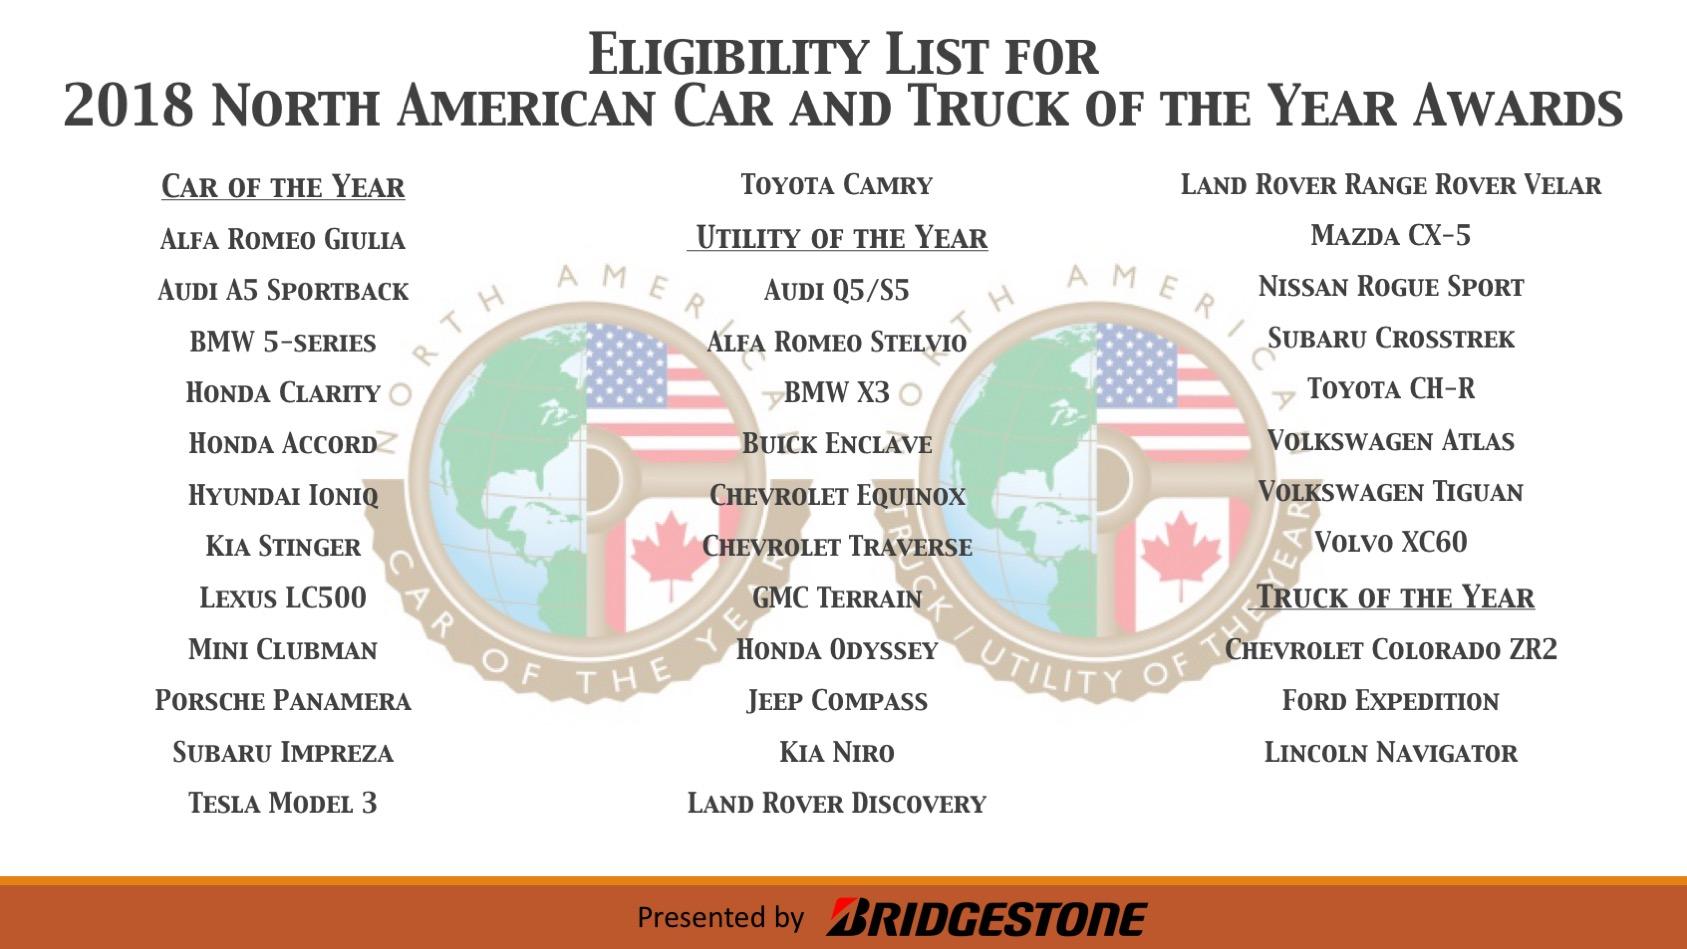 18-Eligibility-List